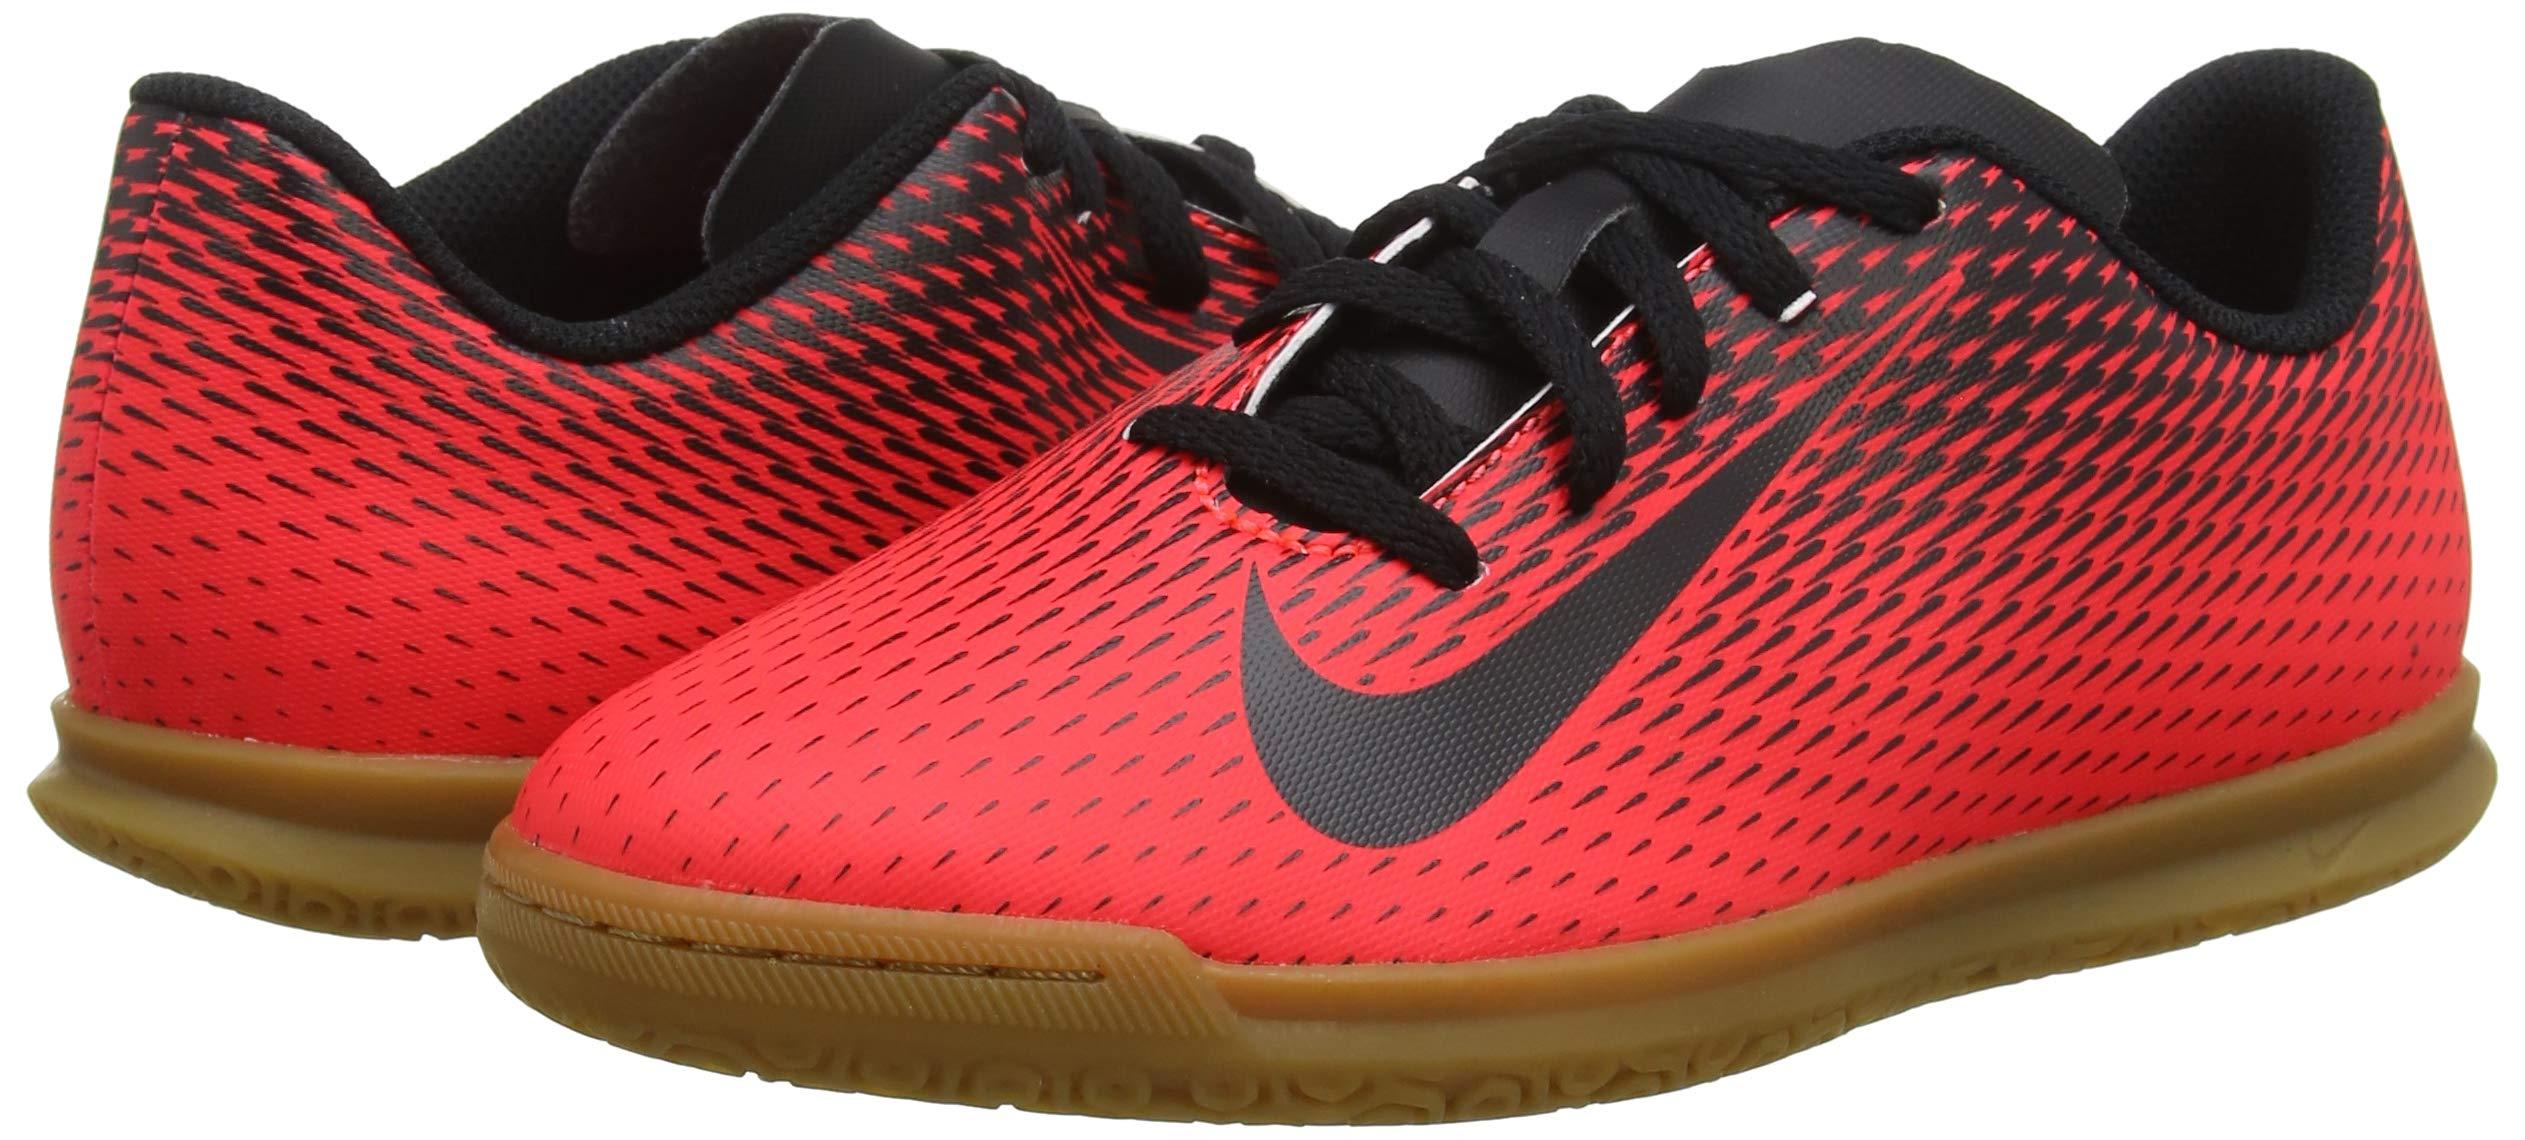 meet af2c8 94d35 Nike Unisex Kids  Jr. Bravatax Ii (ic) Footbal Shoes ...